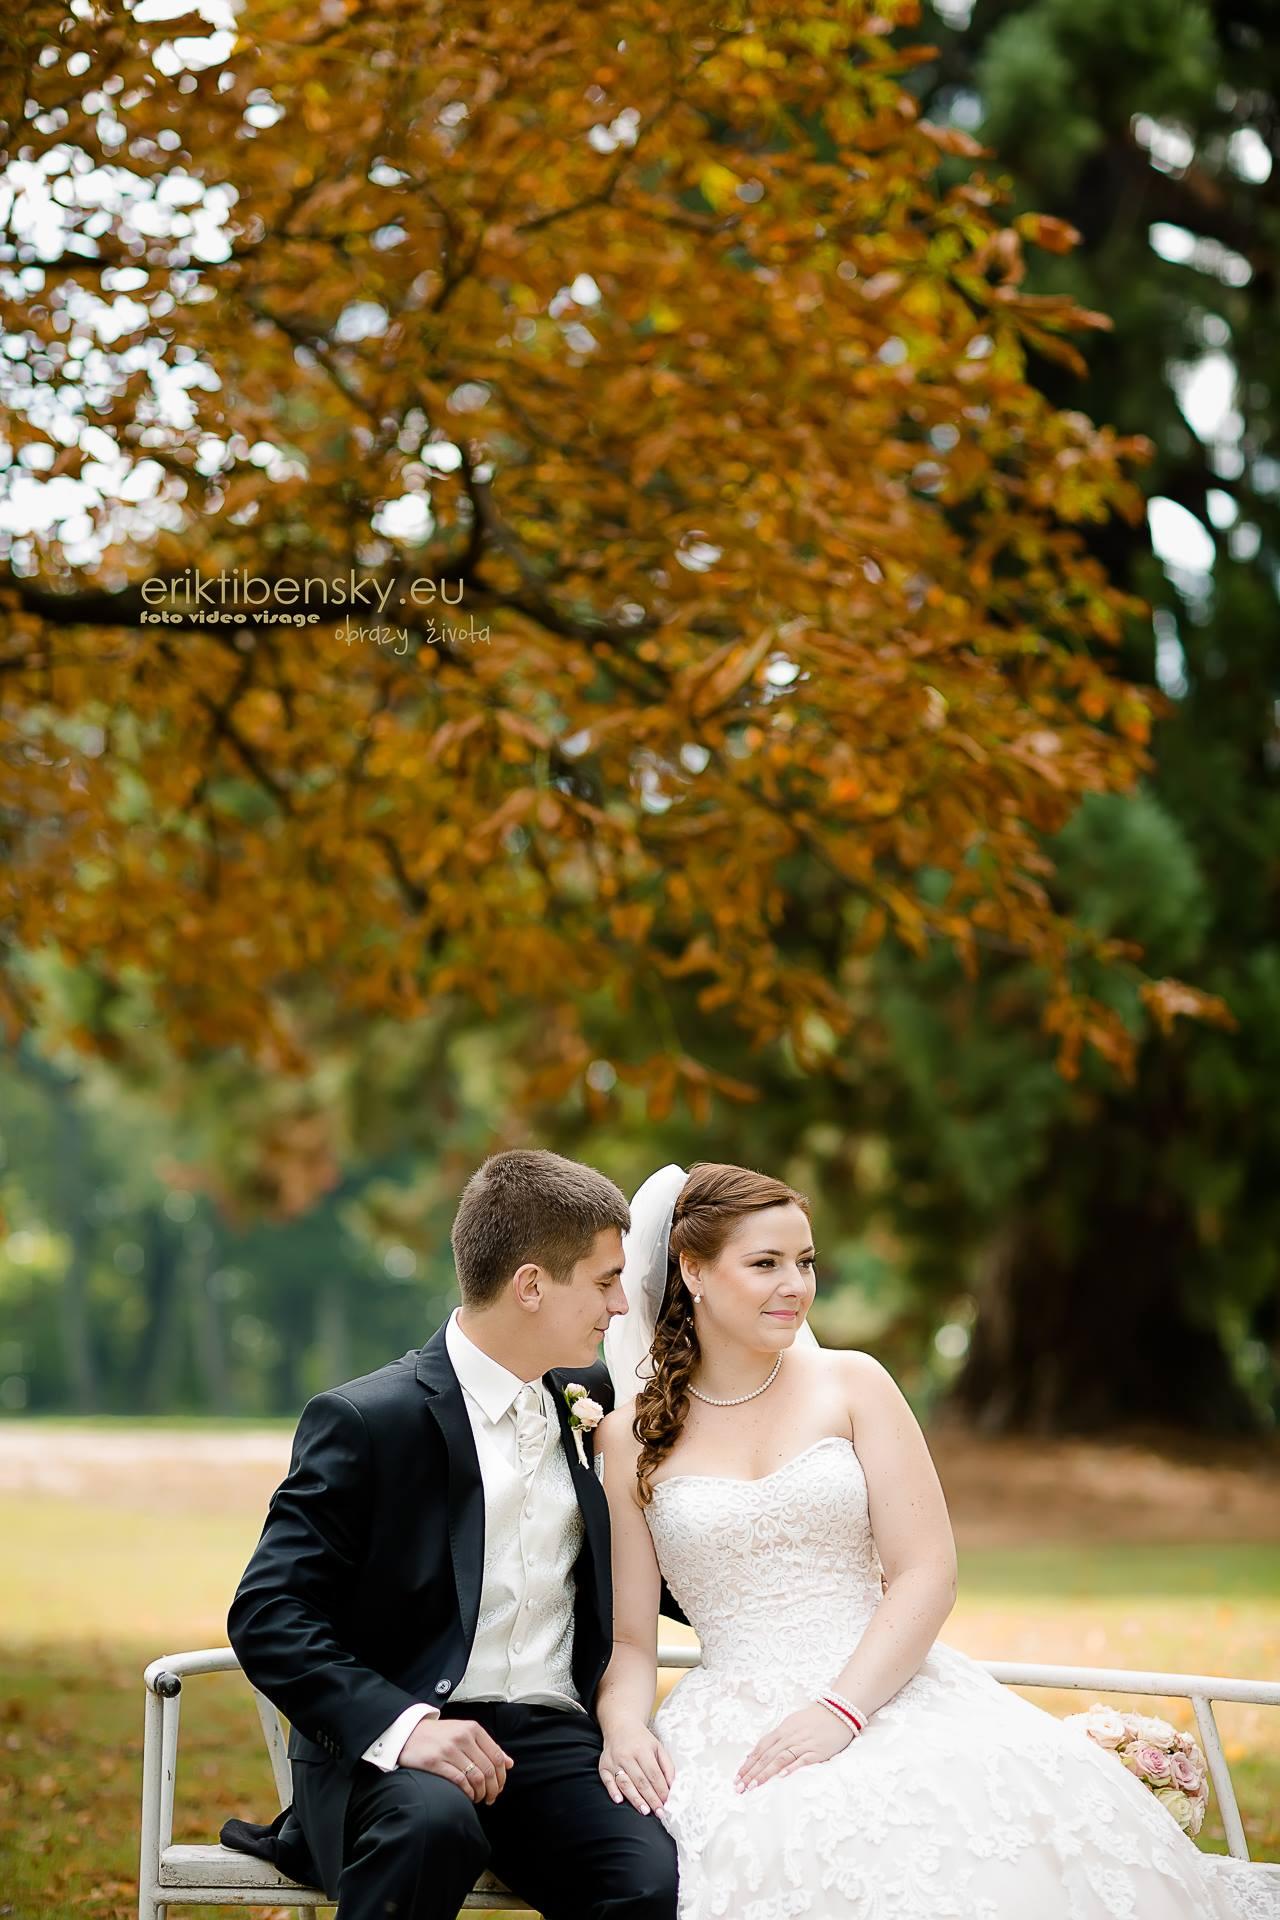 eriktibensky-eu-svadobny-fotograf-wedding-photographer-3086